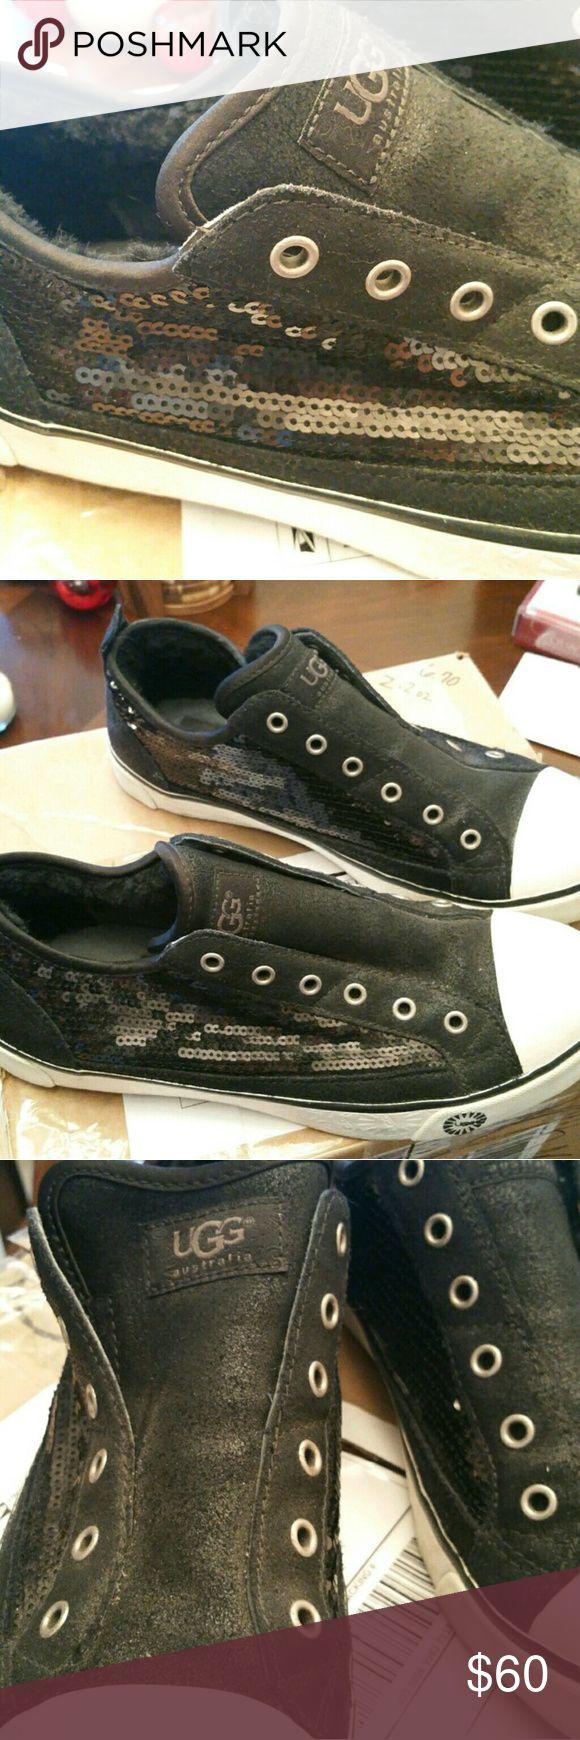 Women's Ugg Sneakers Women's Black Ugg Sneakers Size 8.5 UGG Shoes Sneakers